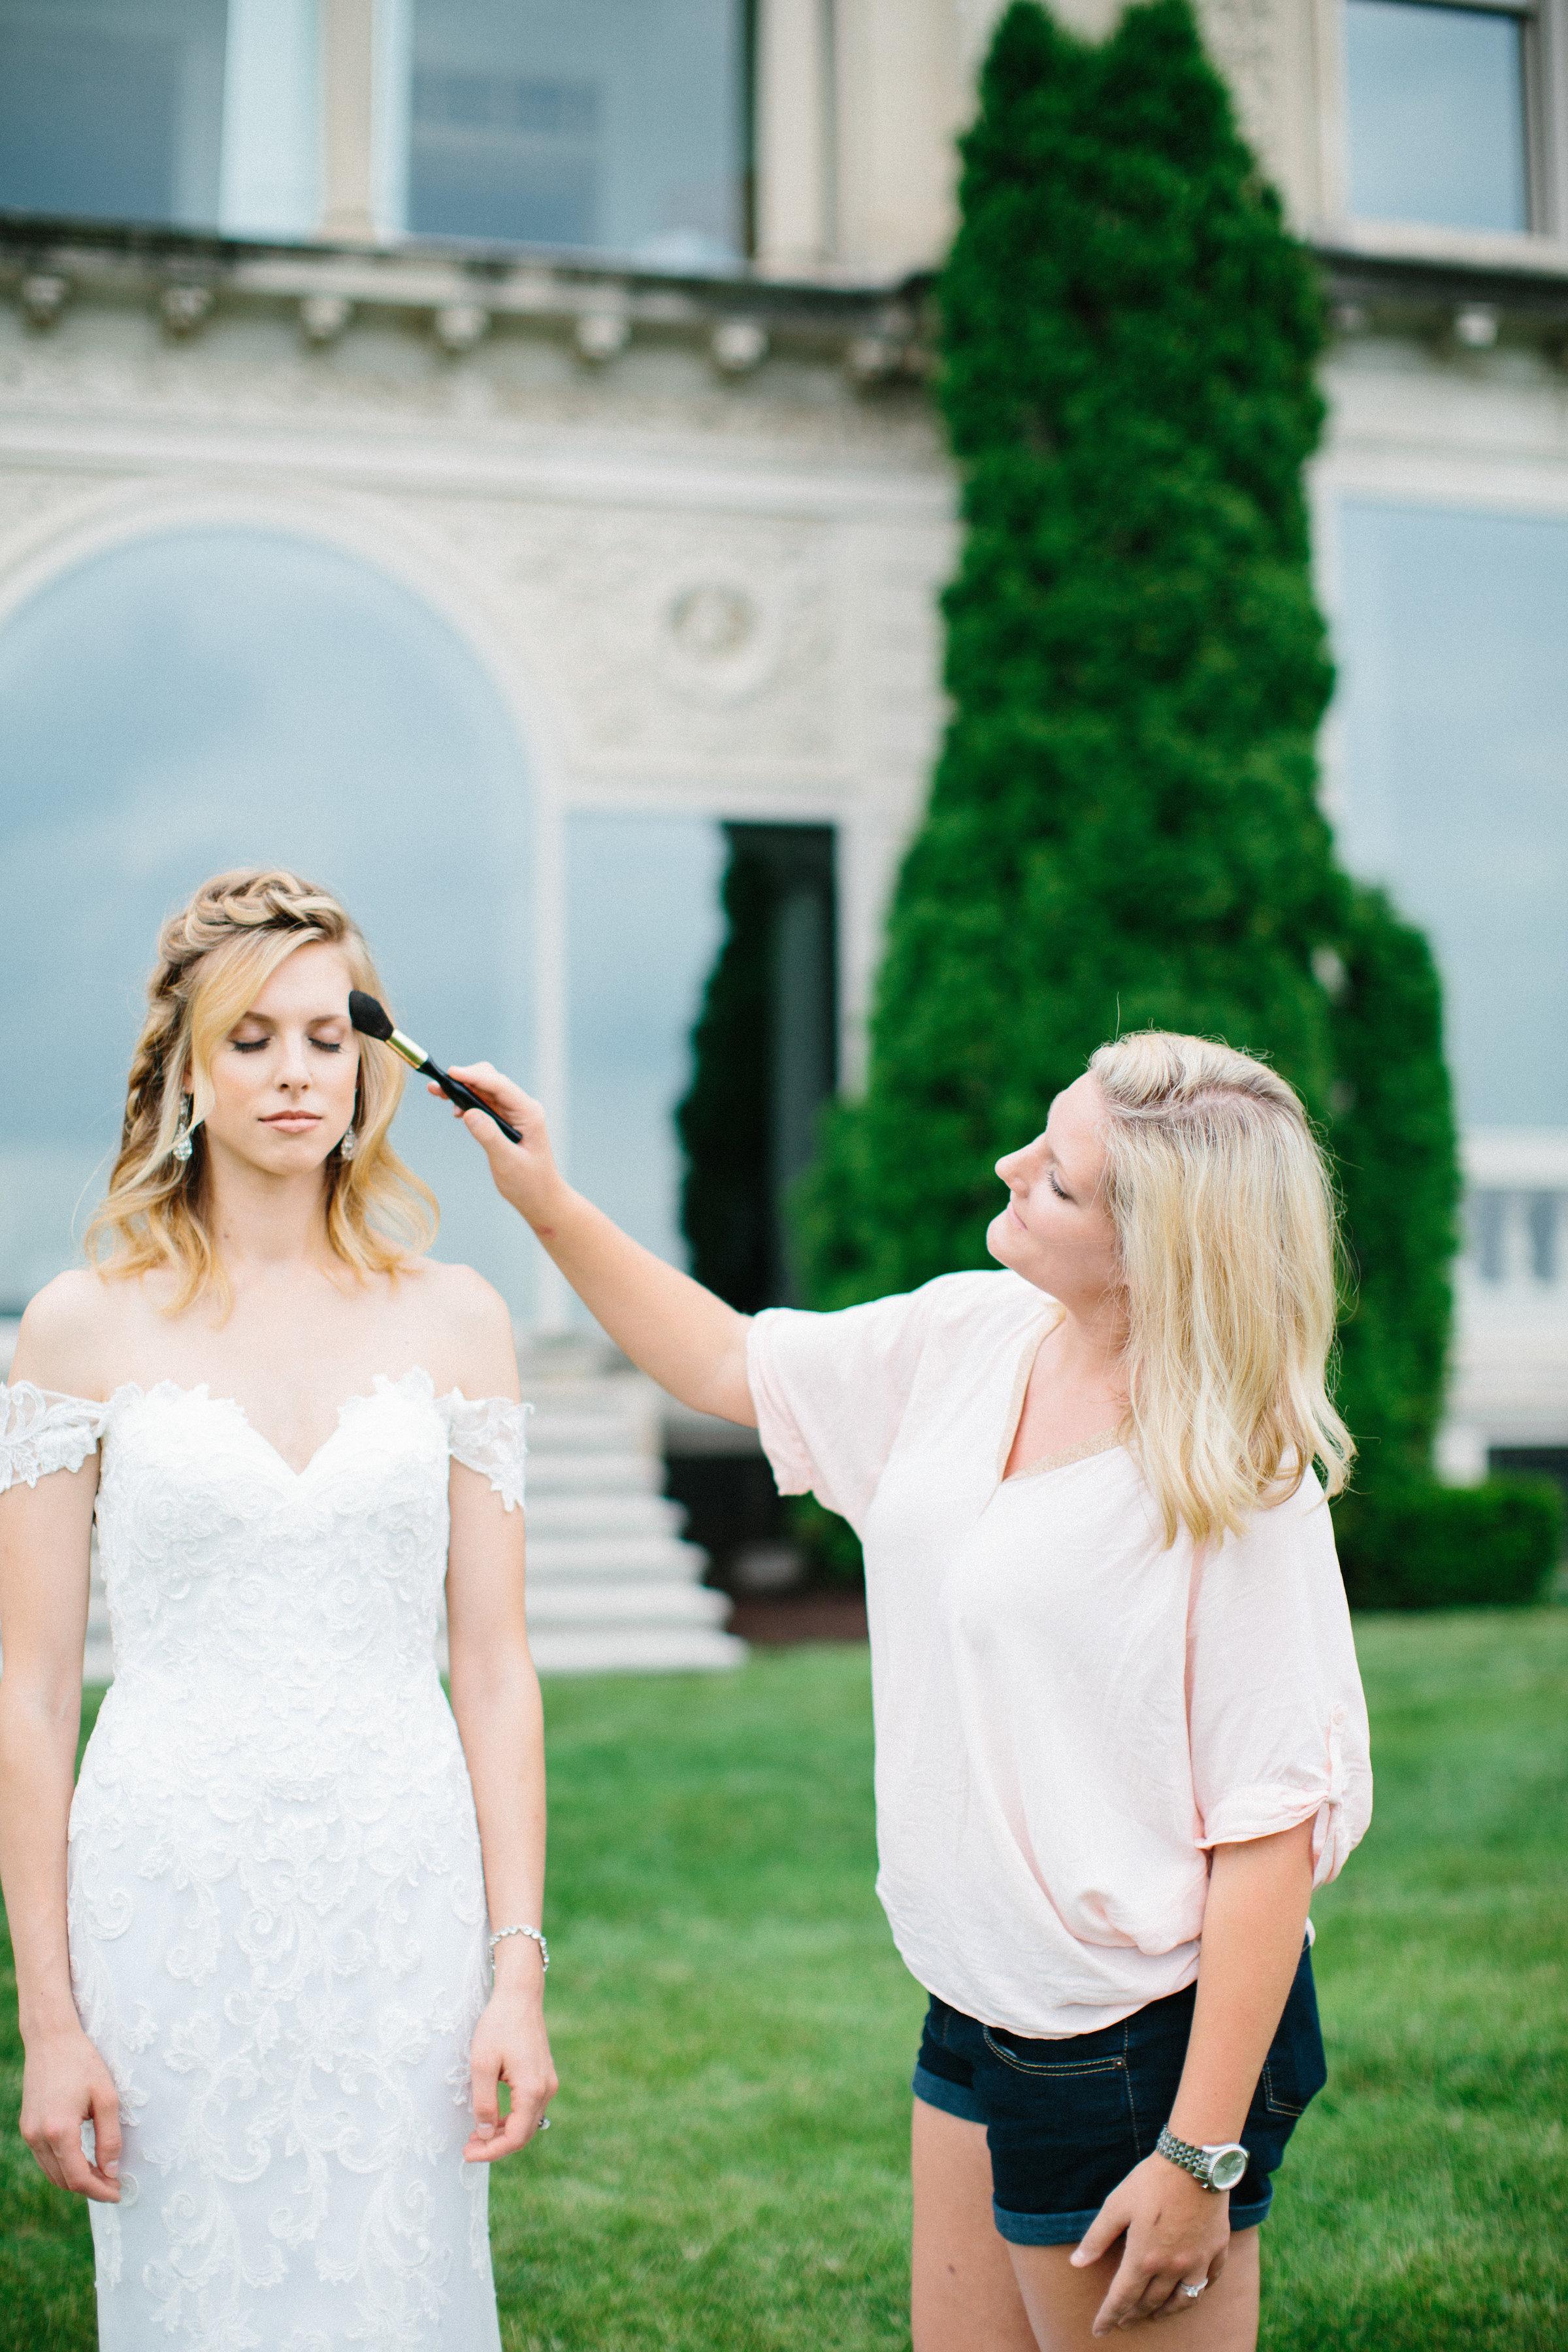 Kristina Lorraine Photography